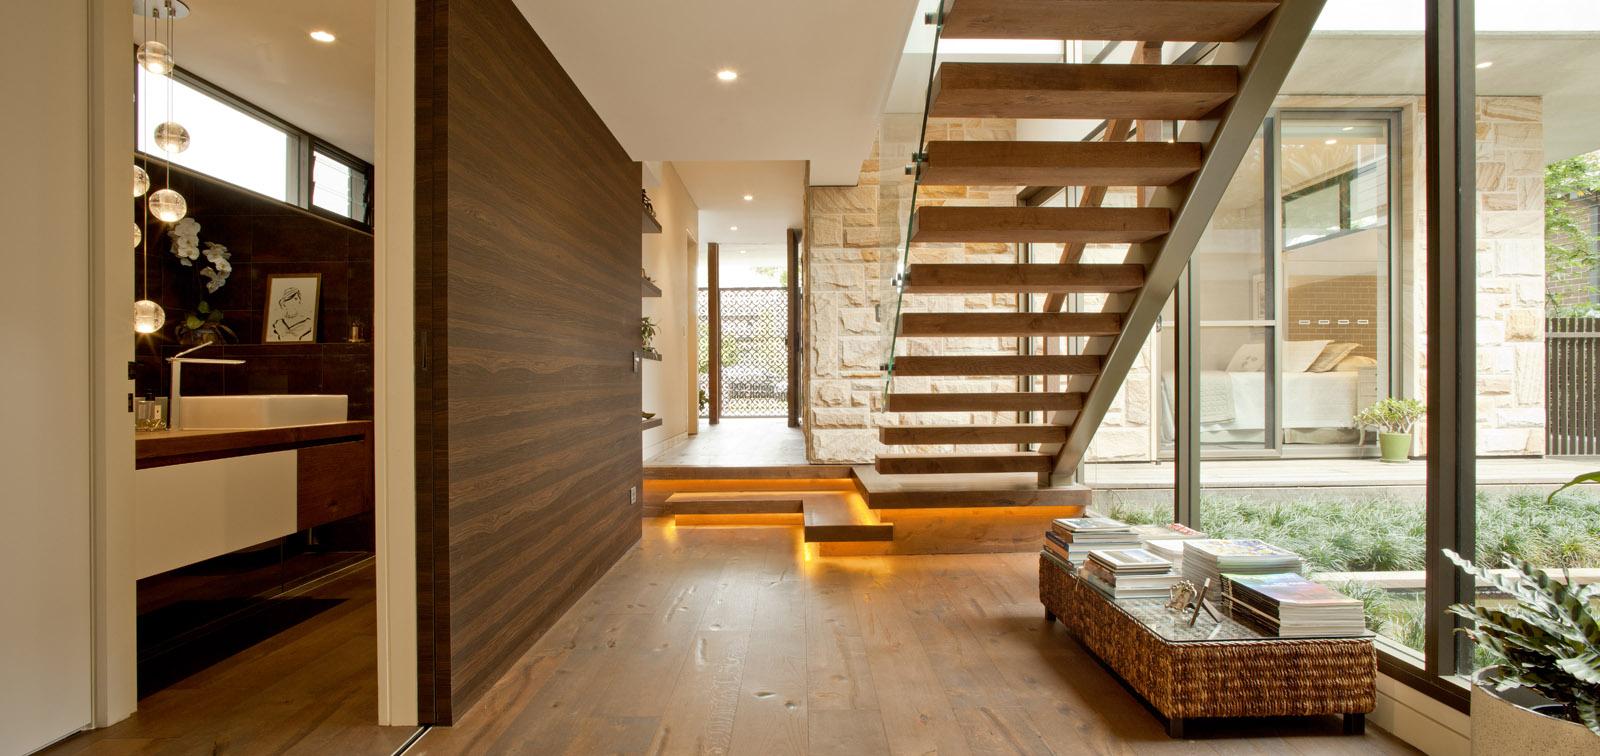 SWP_SRAI-CONCORD HOUSE_IMG_5119.jpg